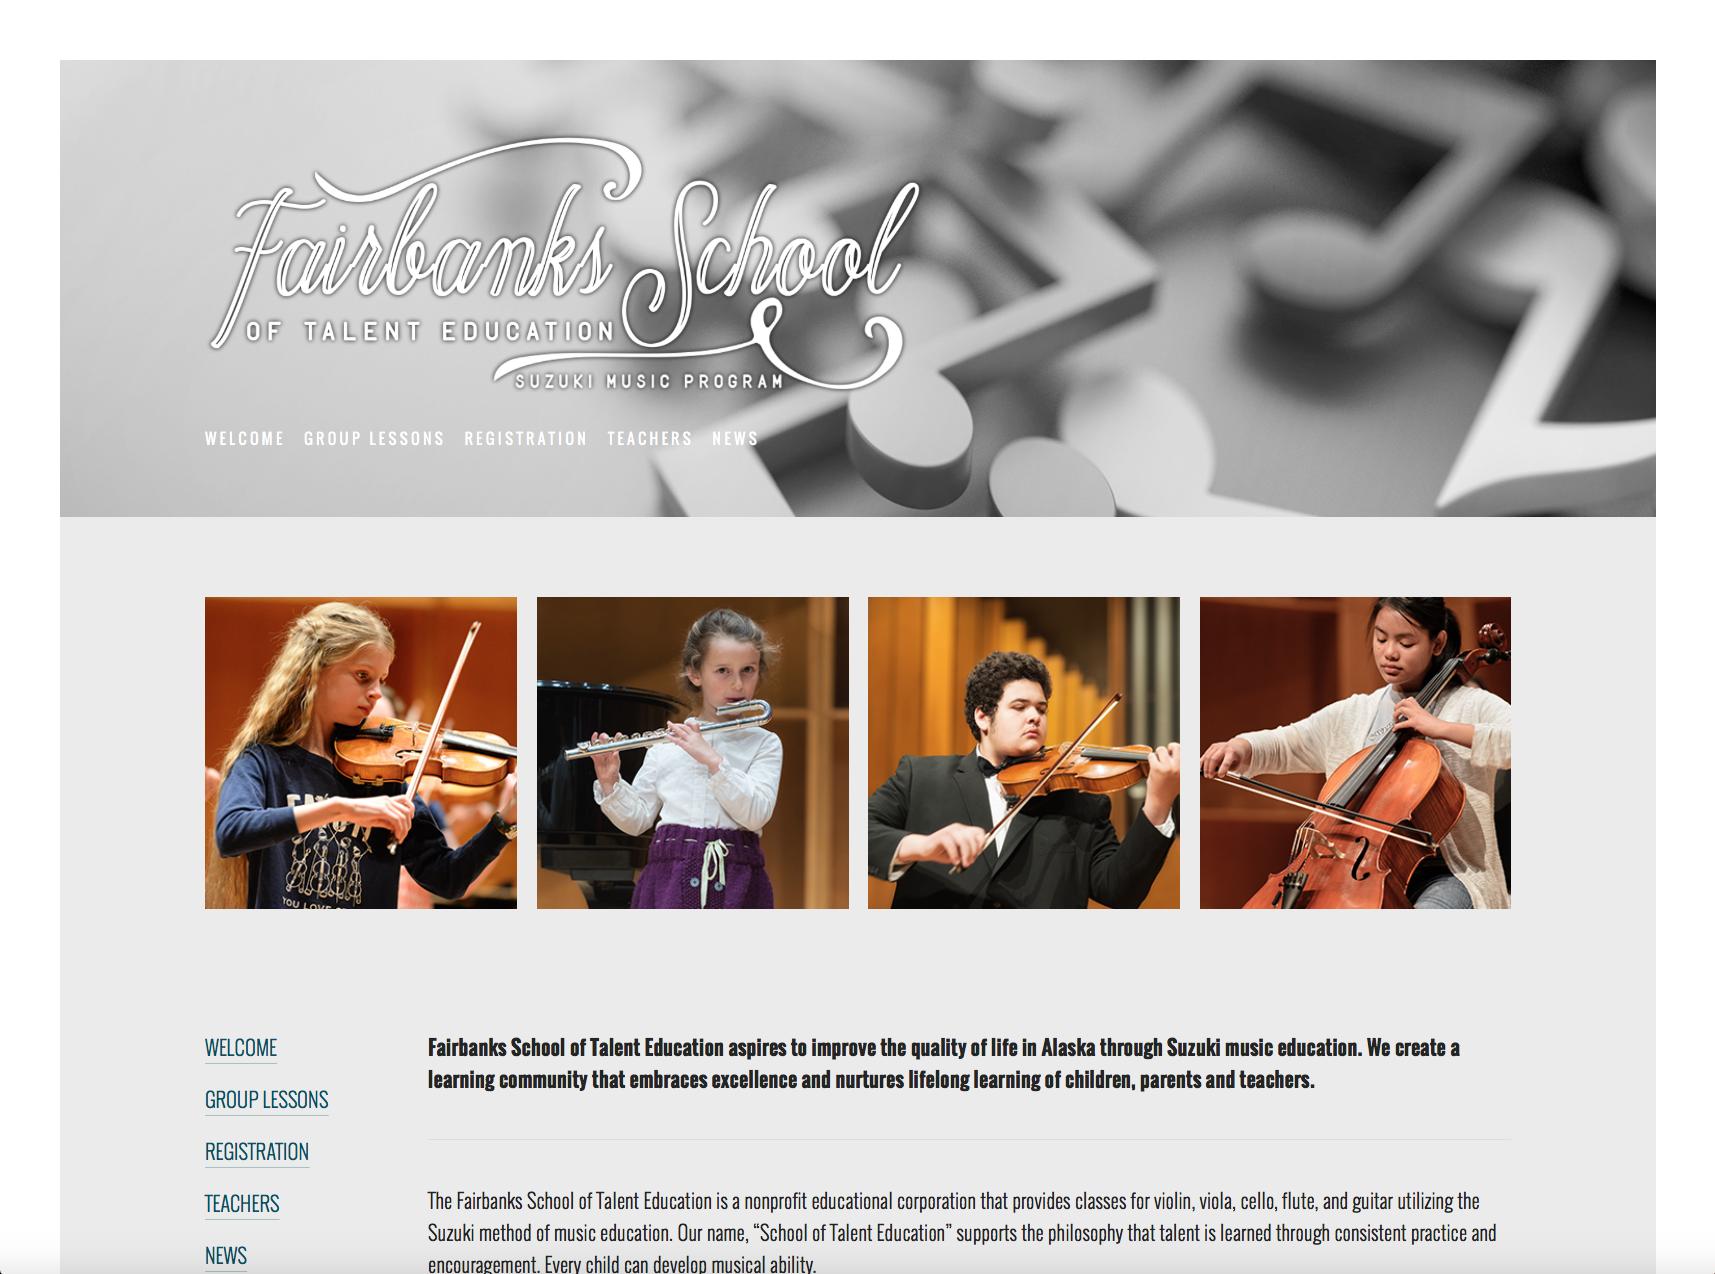 Fairbanks School of Talent Education